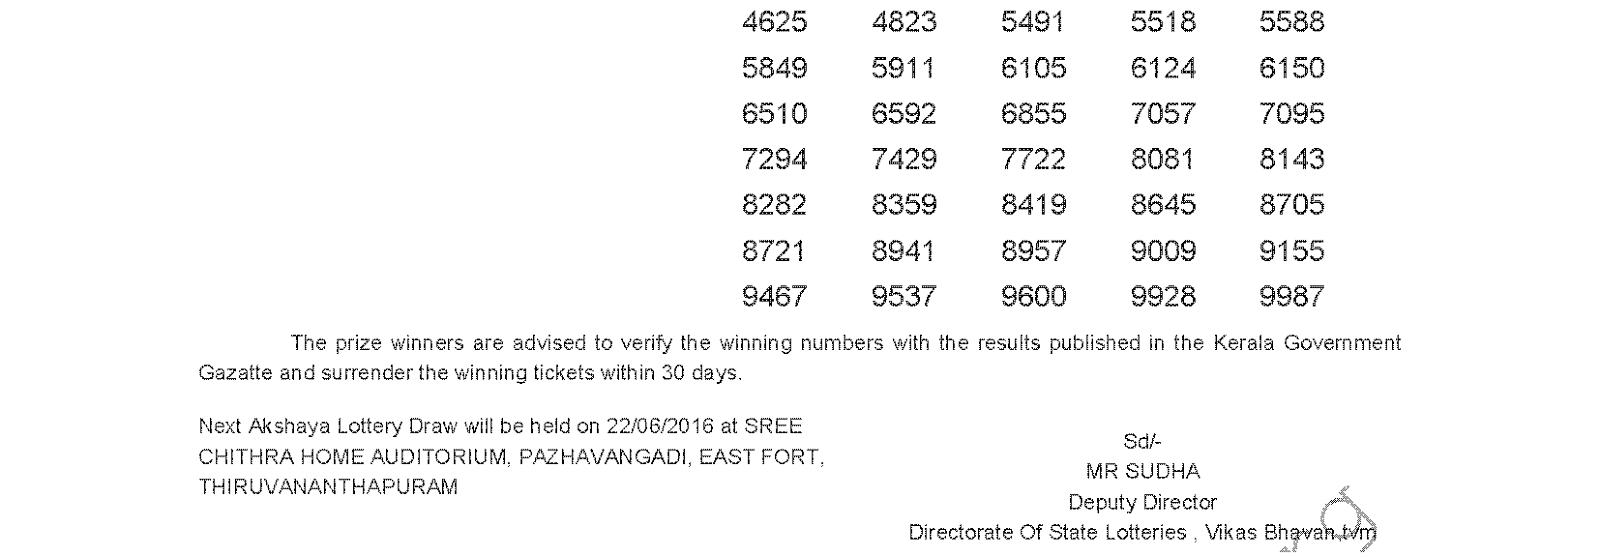 Akshaya AK 246 Lottery Results 15-6-2016